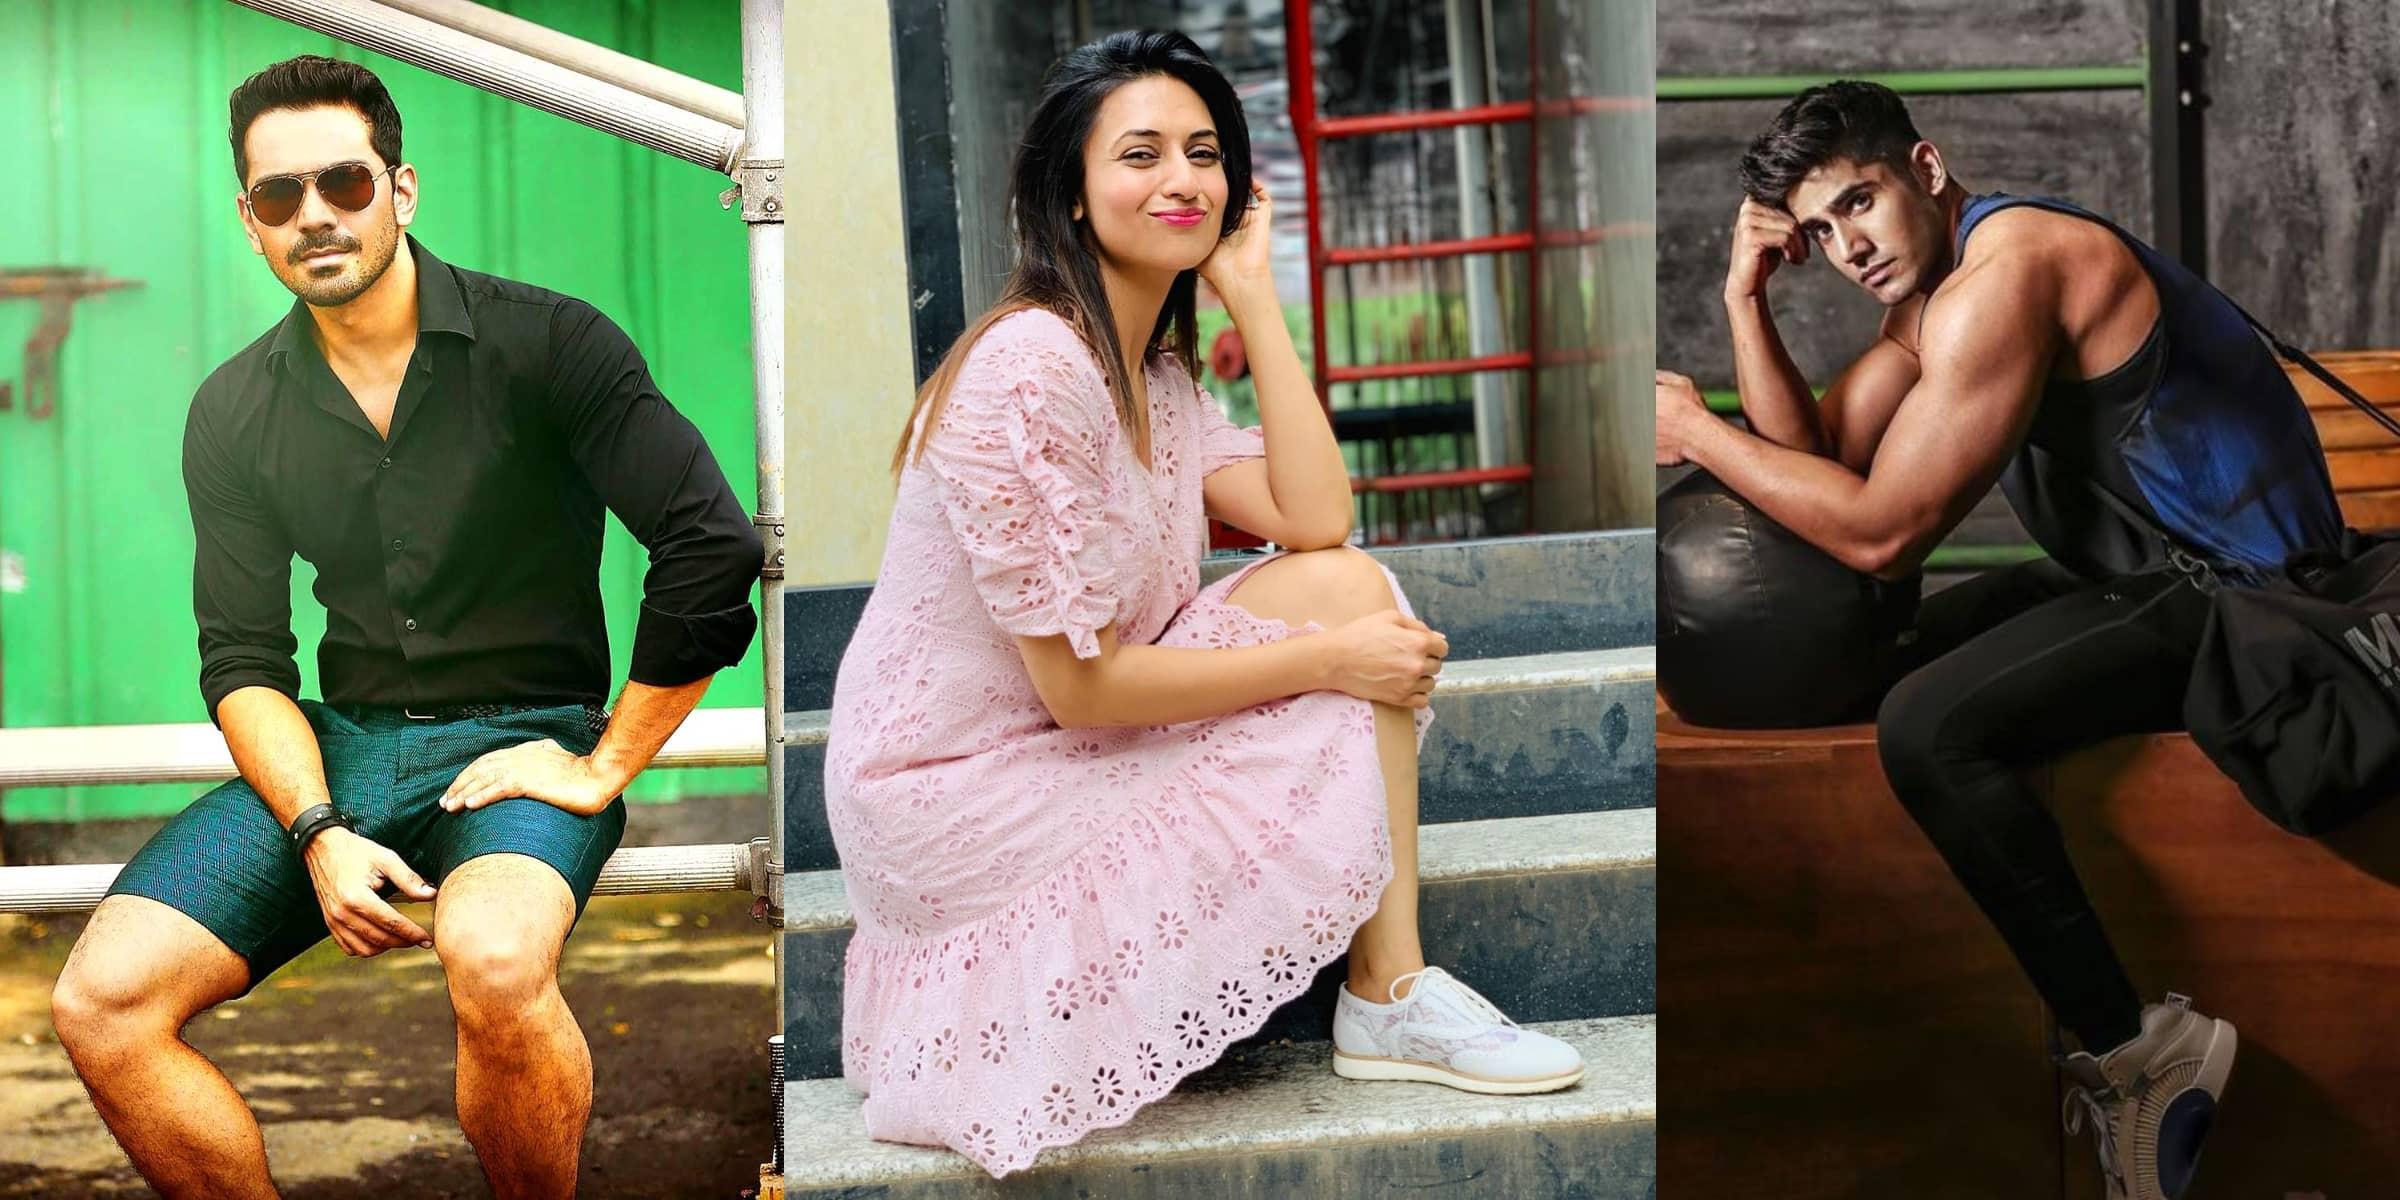 Khatron Ke Khiladi 11: From Abhinav Shukla To Nikki Tamboli To Arjun Bijlani, Here's The Final List Of Contestants